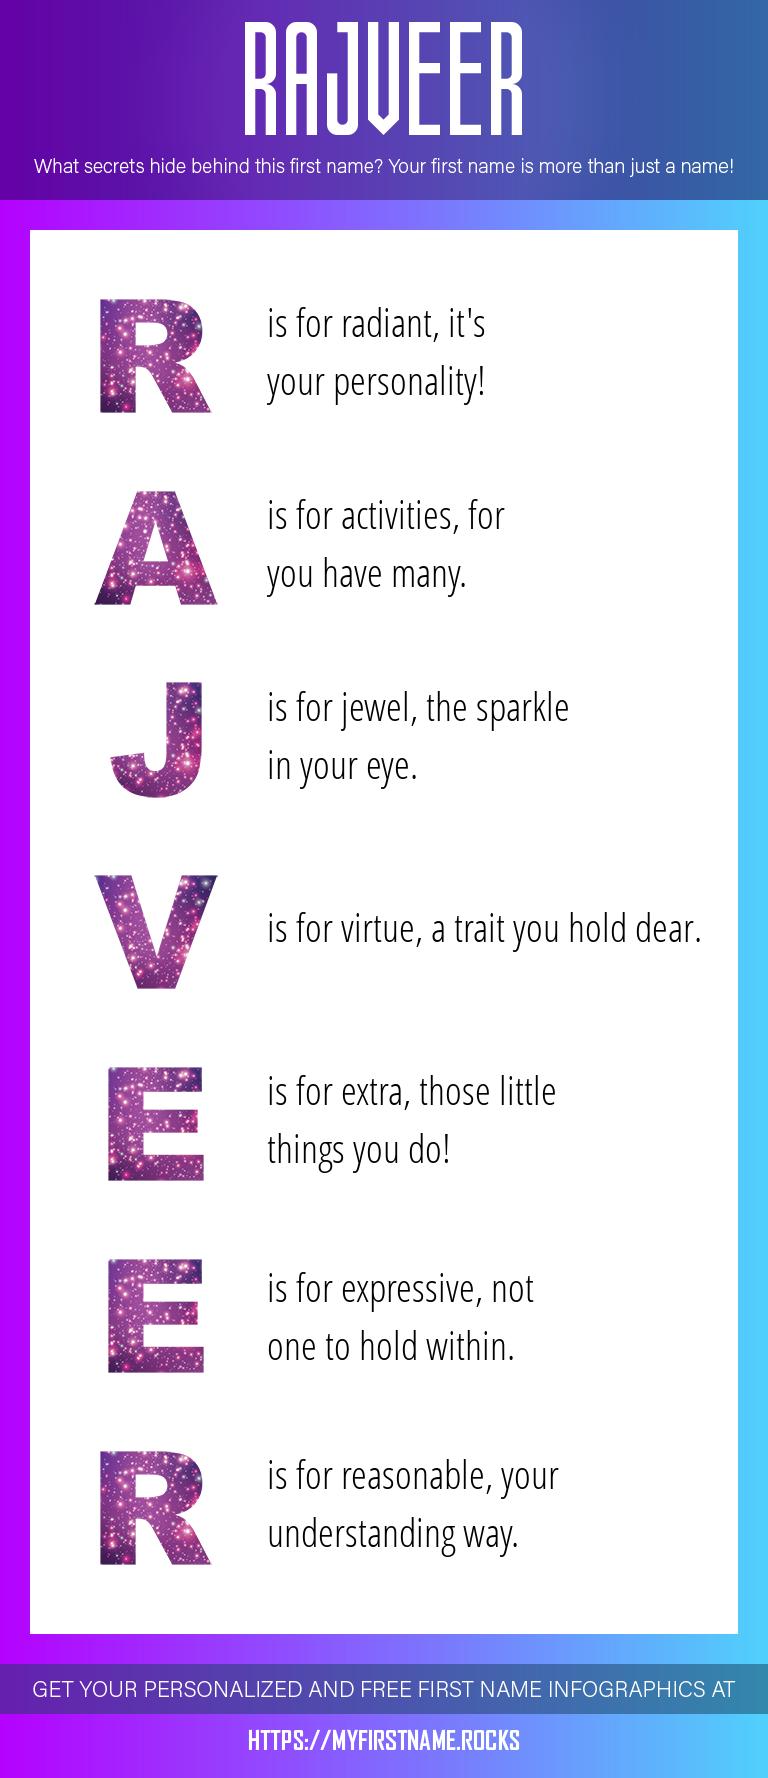 Rajveer Infographics